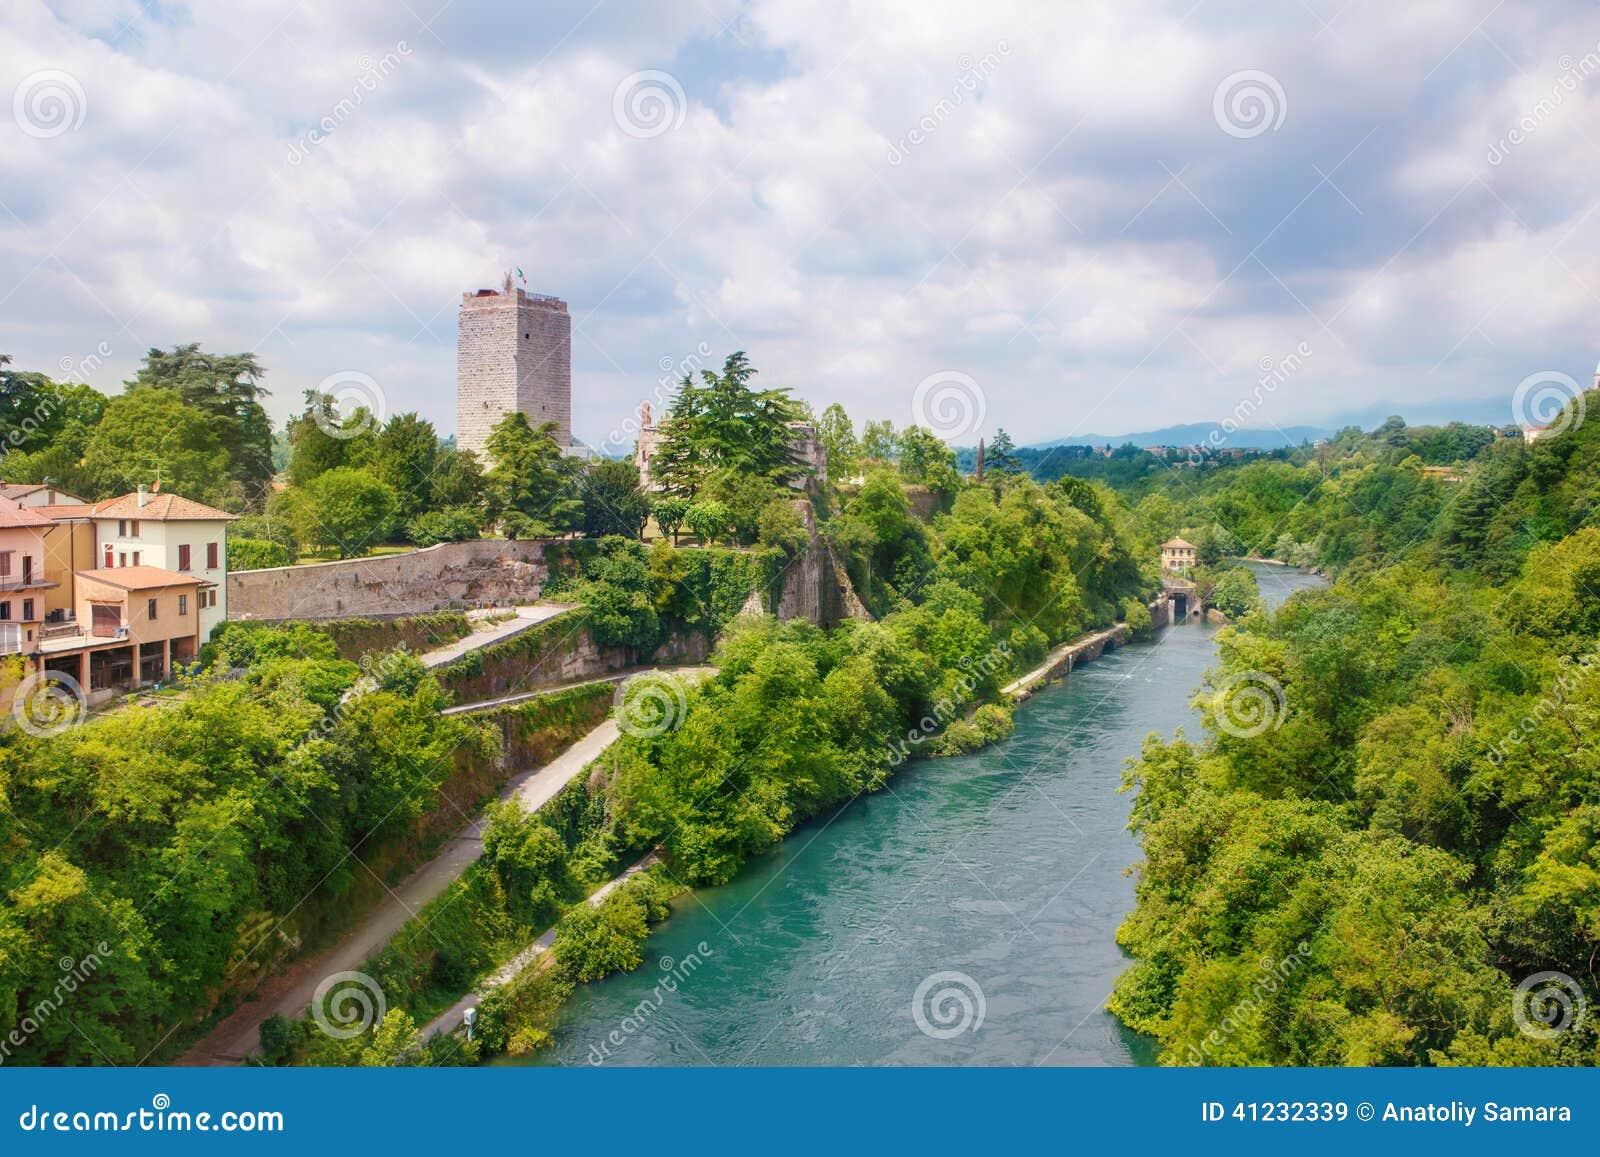 Visconti kasztel i Adda rzeka w Trezzo sull Adda